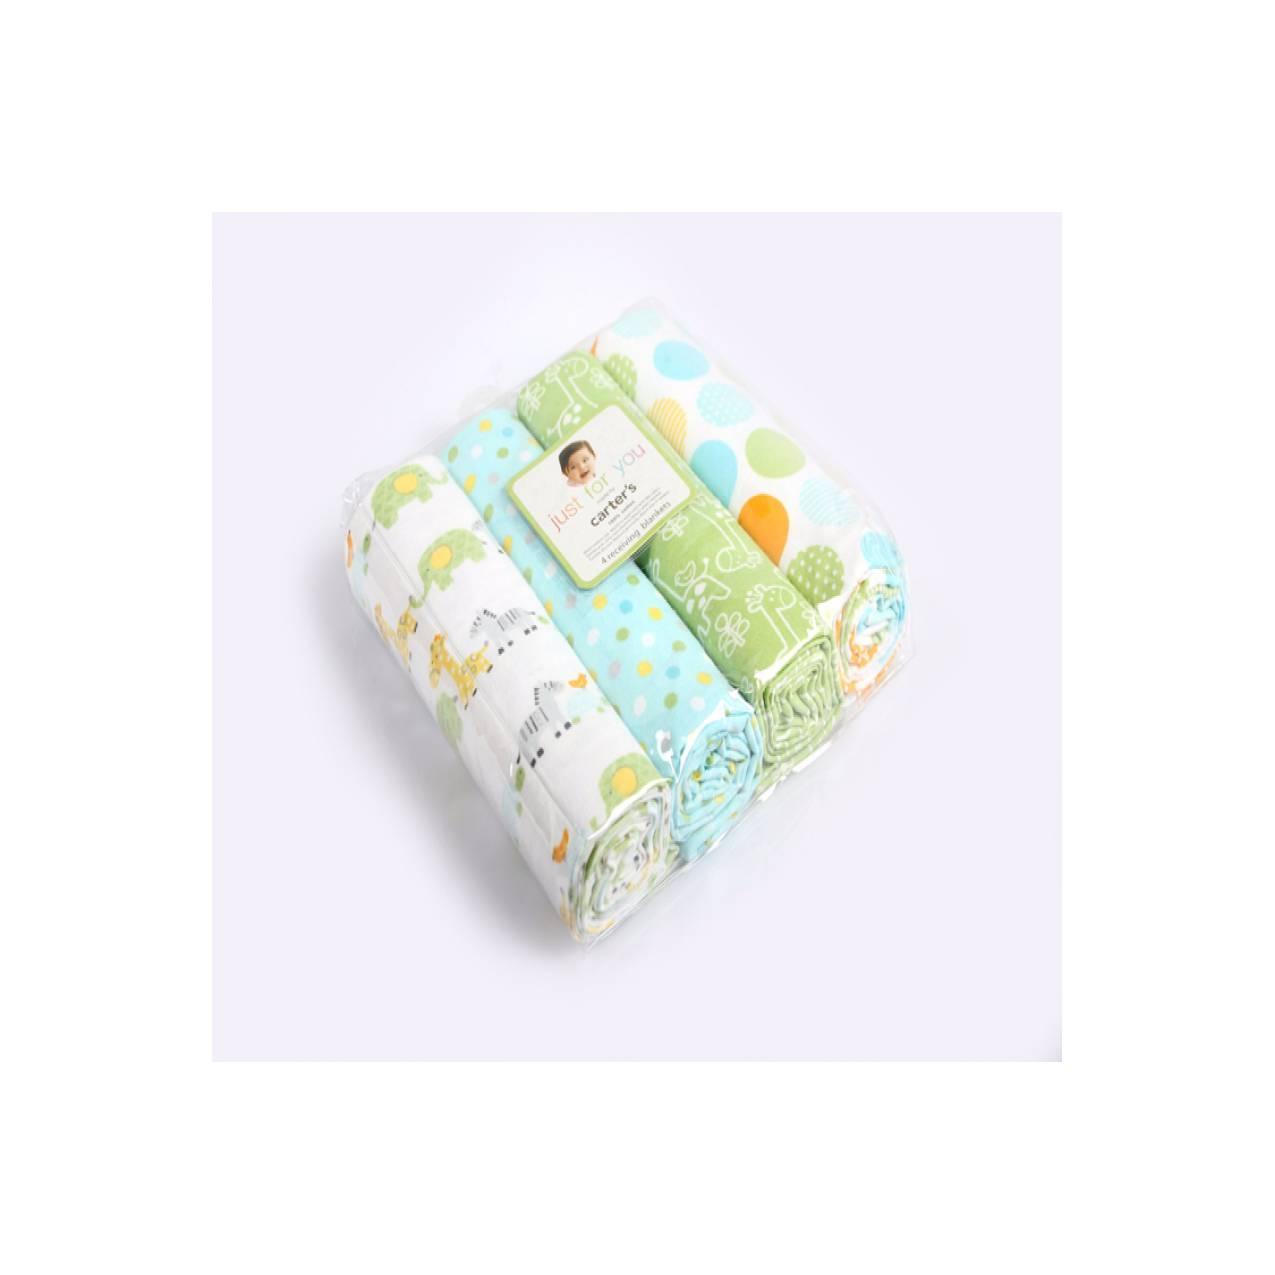 Adora Baby Bantal Leher Kolaco Neck Pillow Owl Daftar Harga Minigood Model Hewan Lucu U Travelling 83972 Receiving Blanket Animal